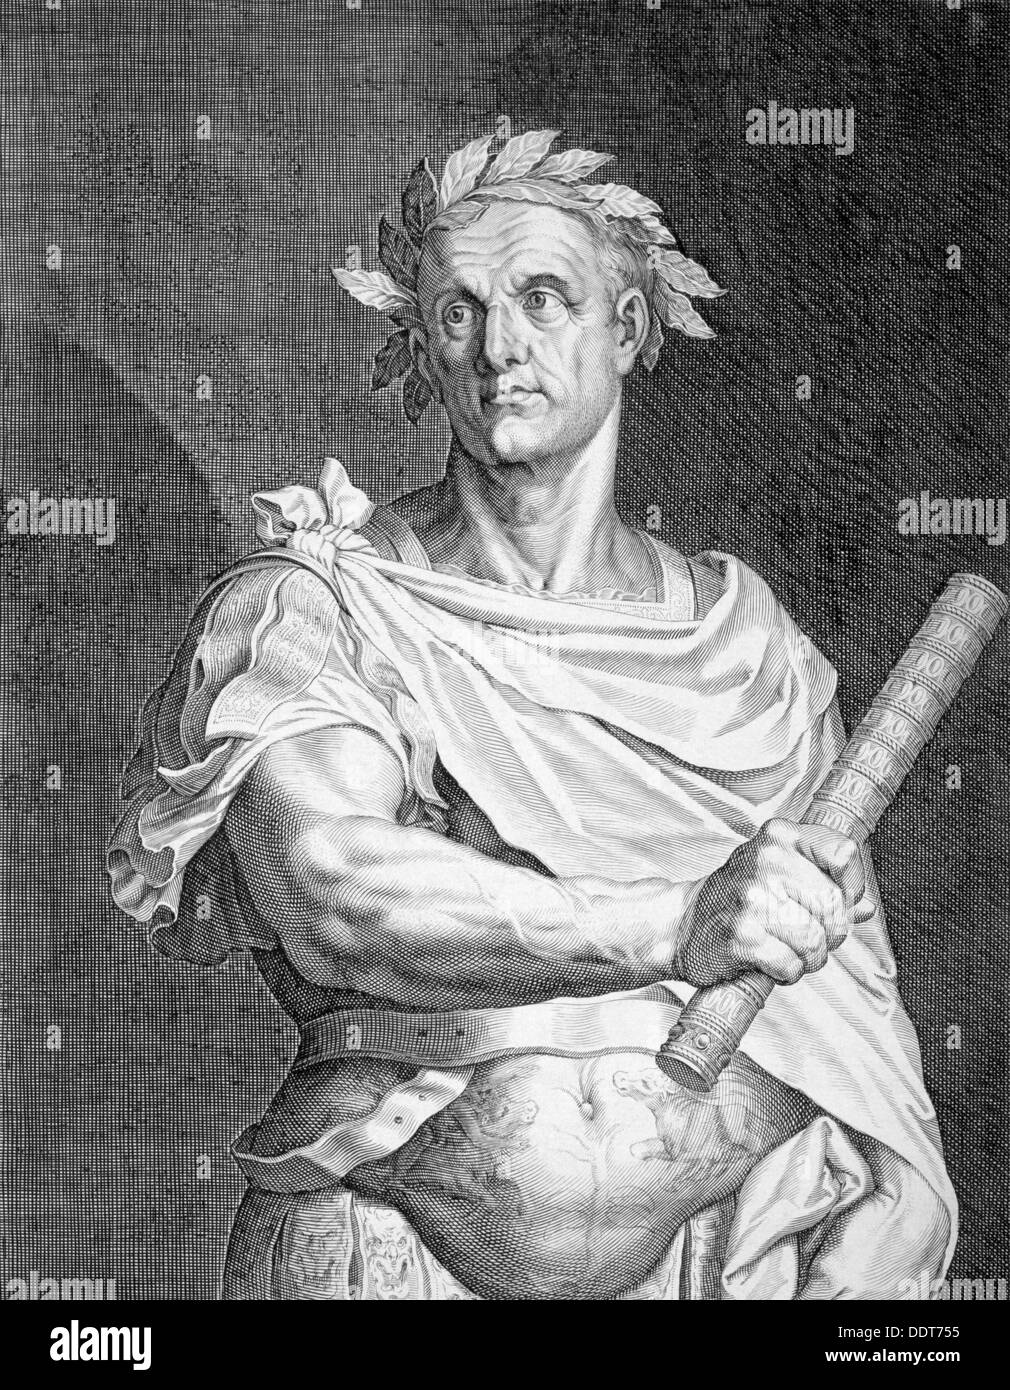 Julius Caesar, Roman soldier and statesman, (c1590-1629). Artist: Aegidius Sadeler II - Stock Image